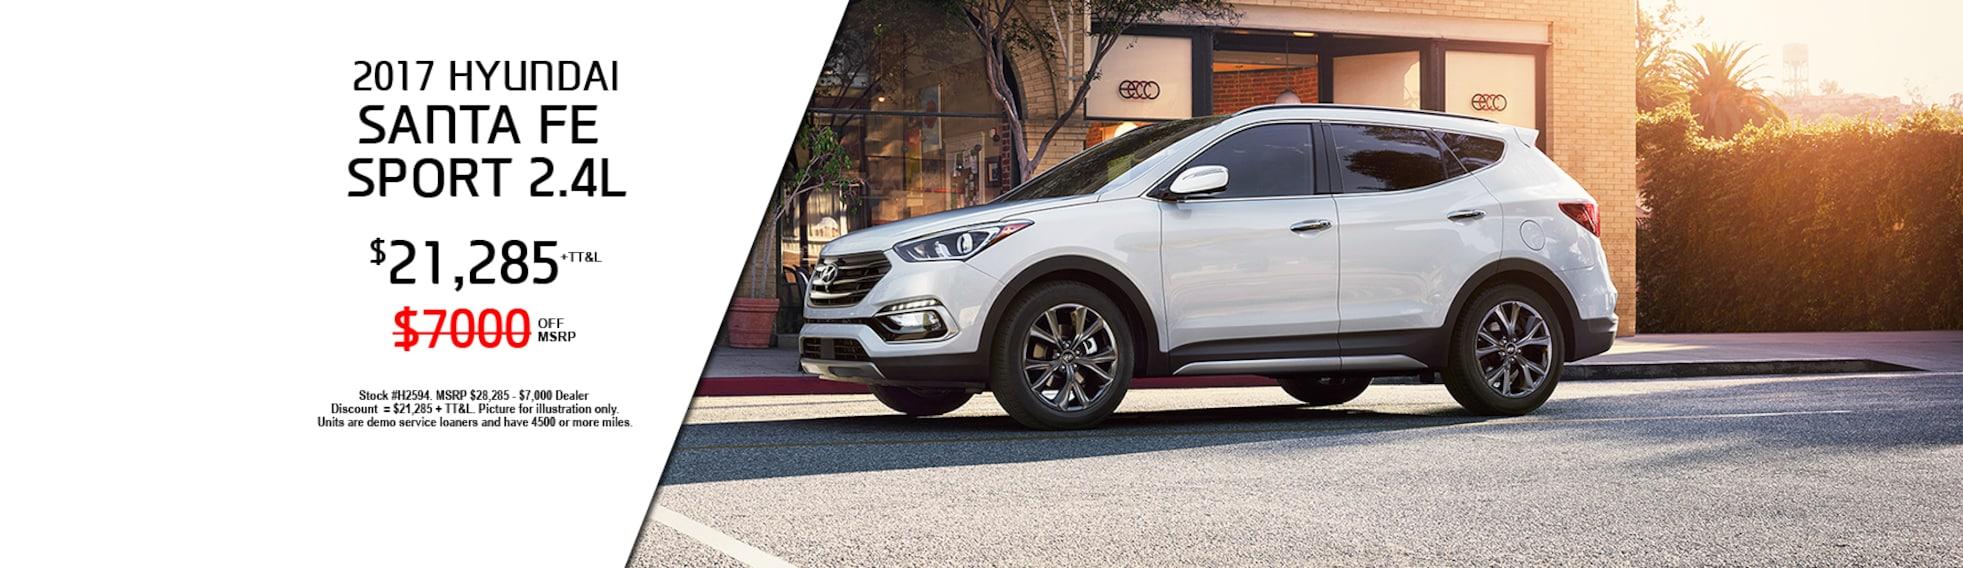 Roger Beasley Hyundai >> New Hyundai & Used Car Dealership serving the San Antonio area   Roger Beasley Hyundai Kyle